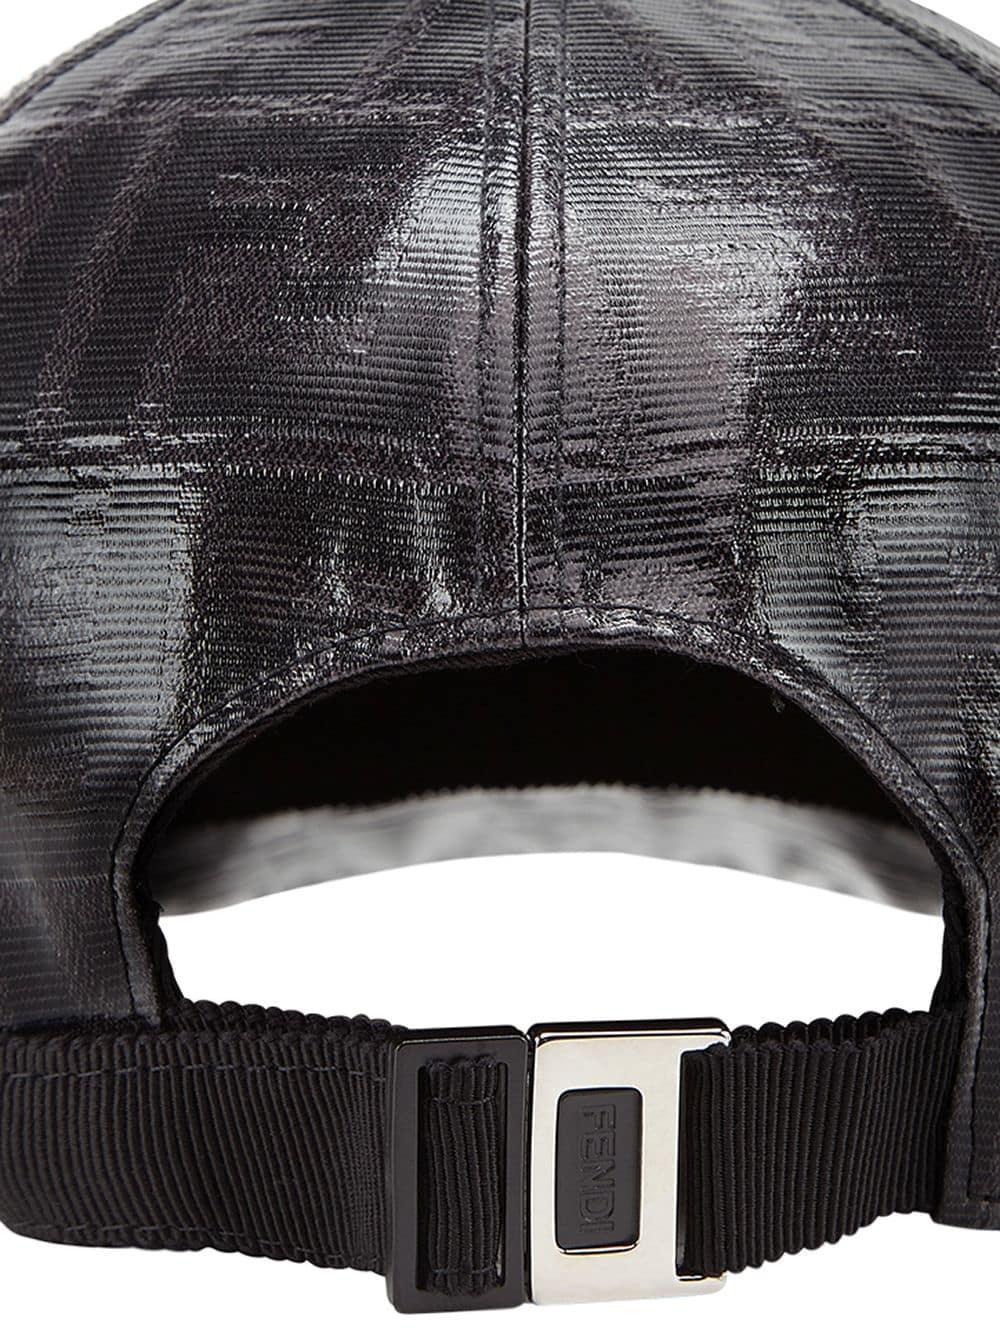 db0f960cd5959 Fendi - Black Cotton Baseball Hat for Men - Lyst. View fullscreen